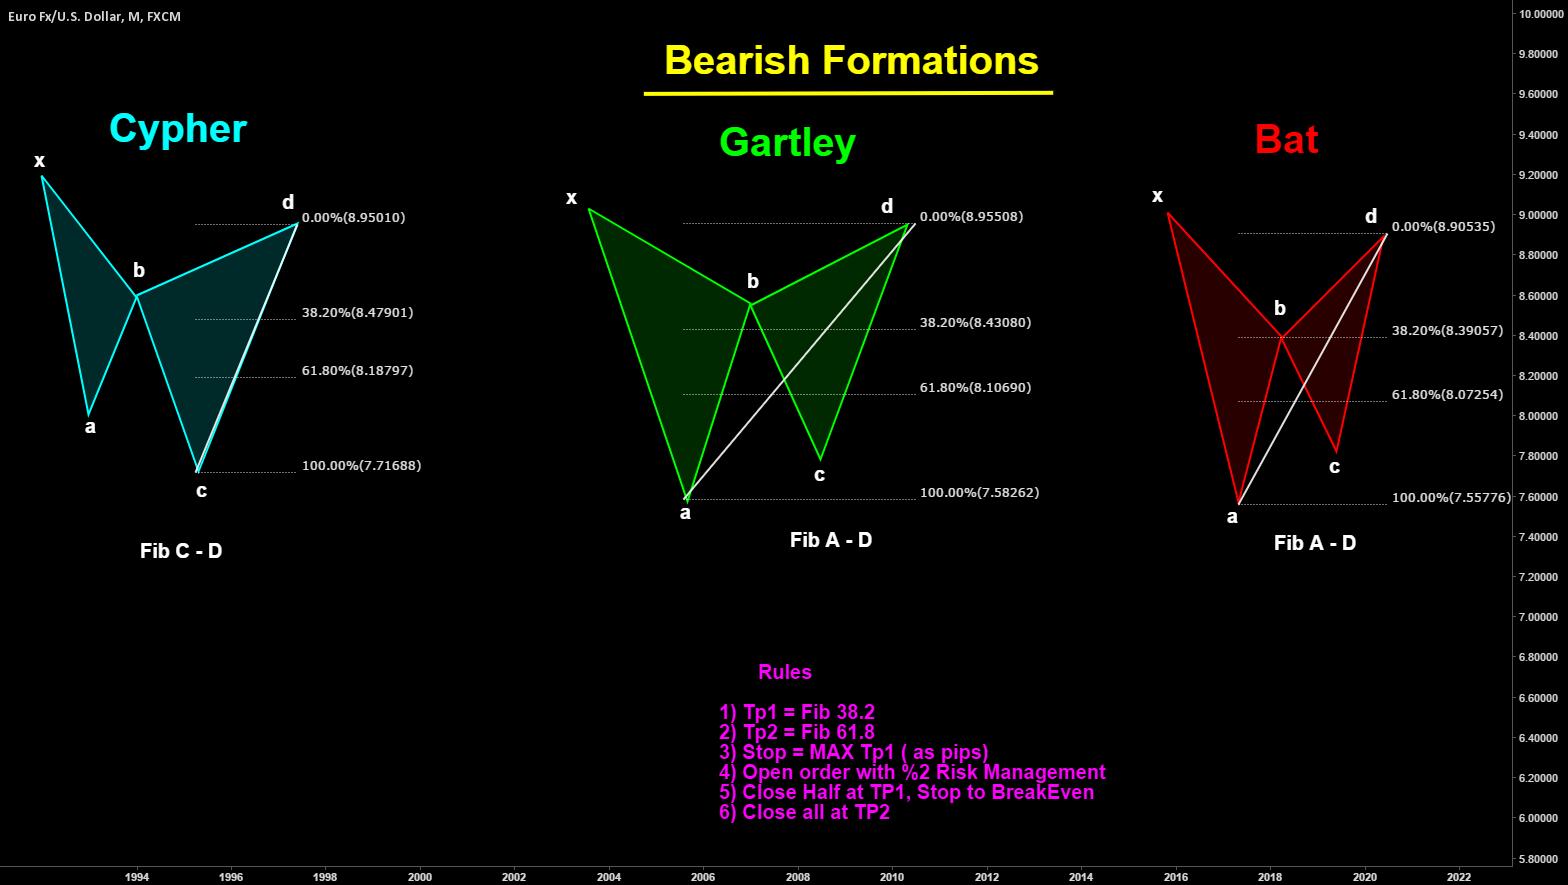 BEARISH HARMONIC FORMATIONS